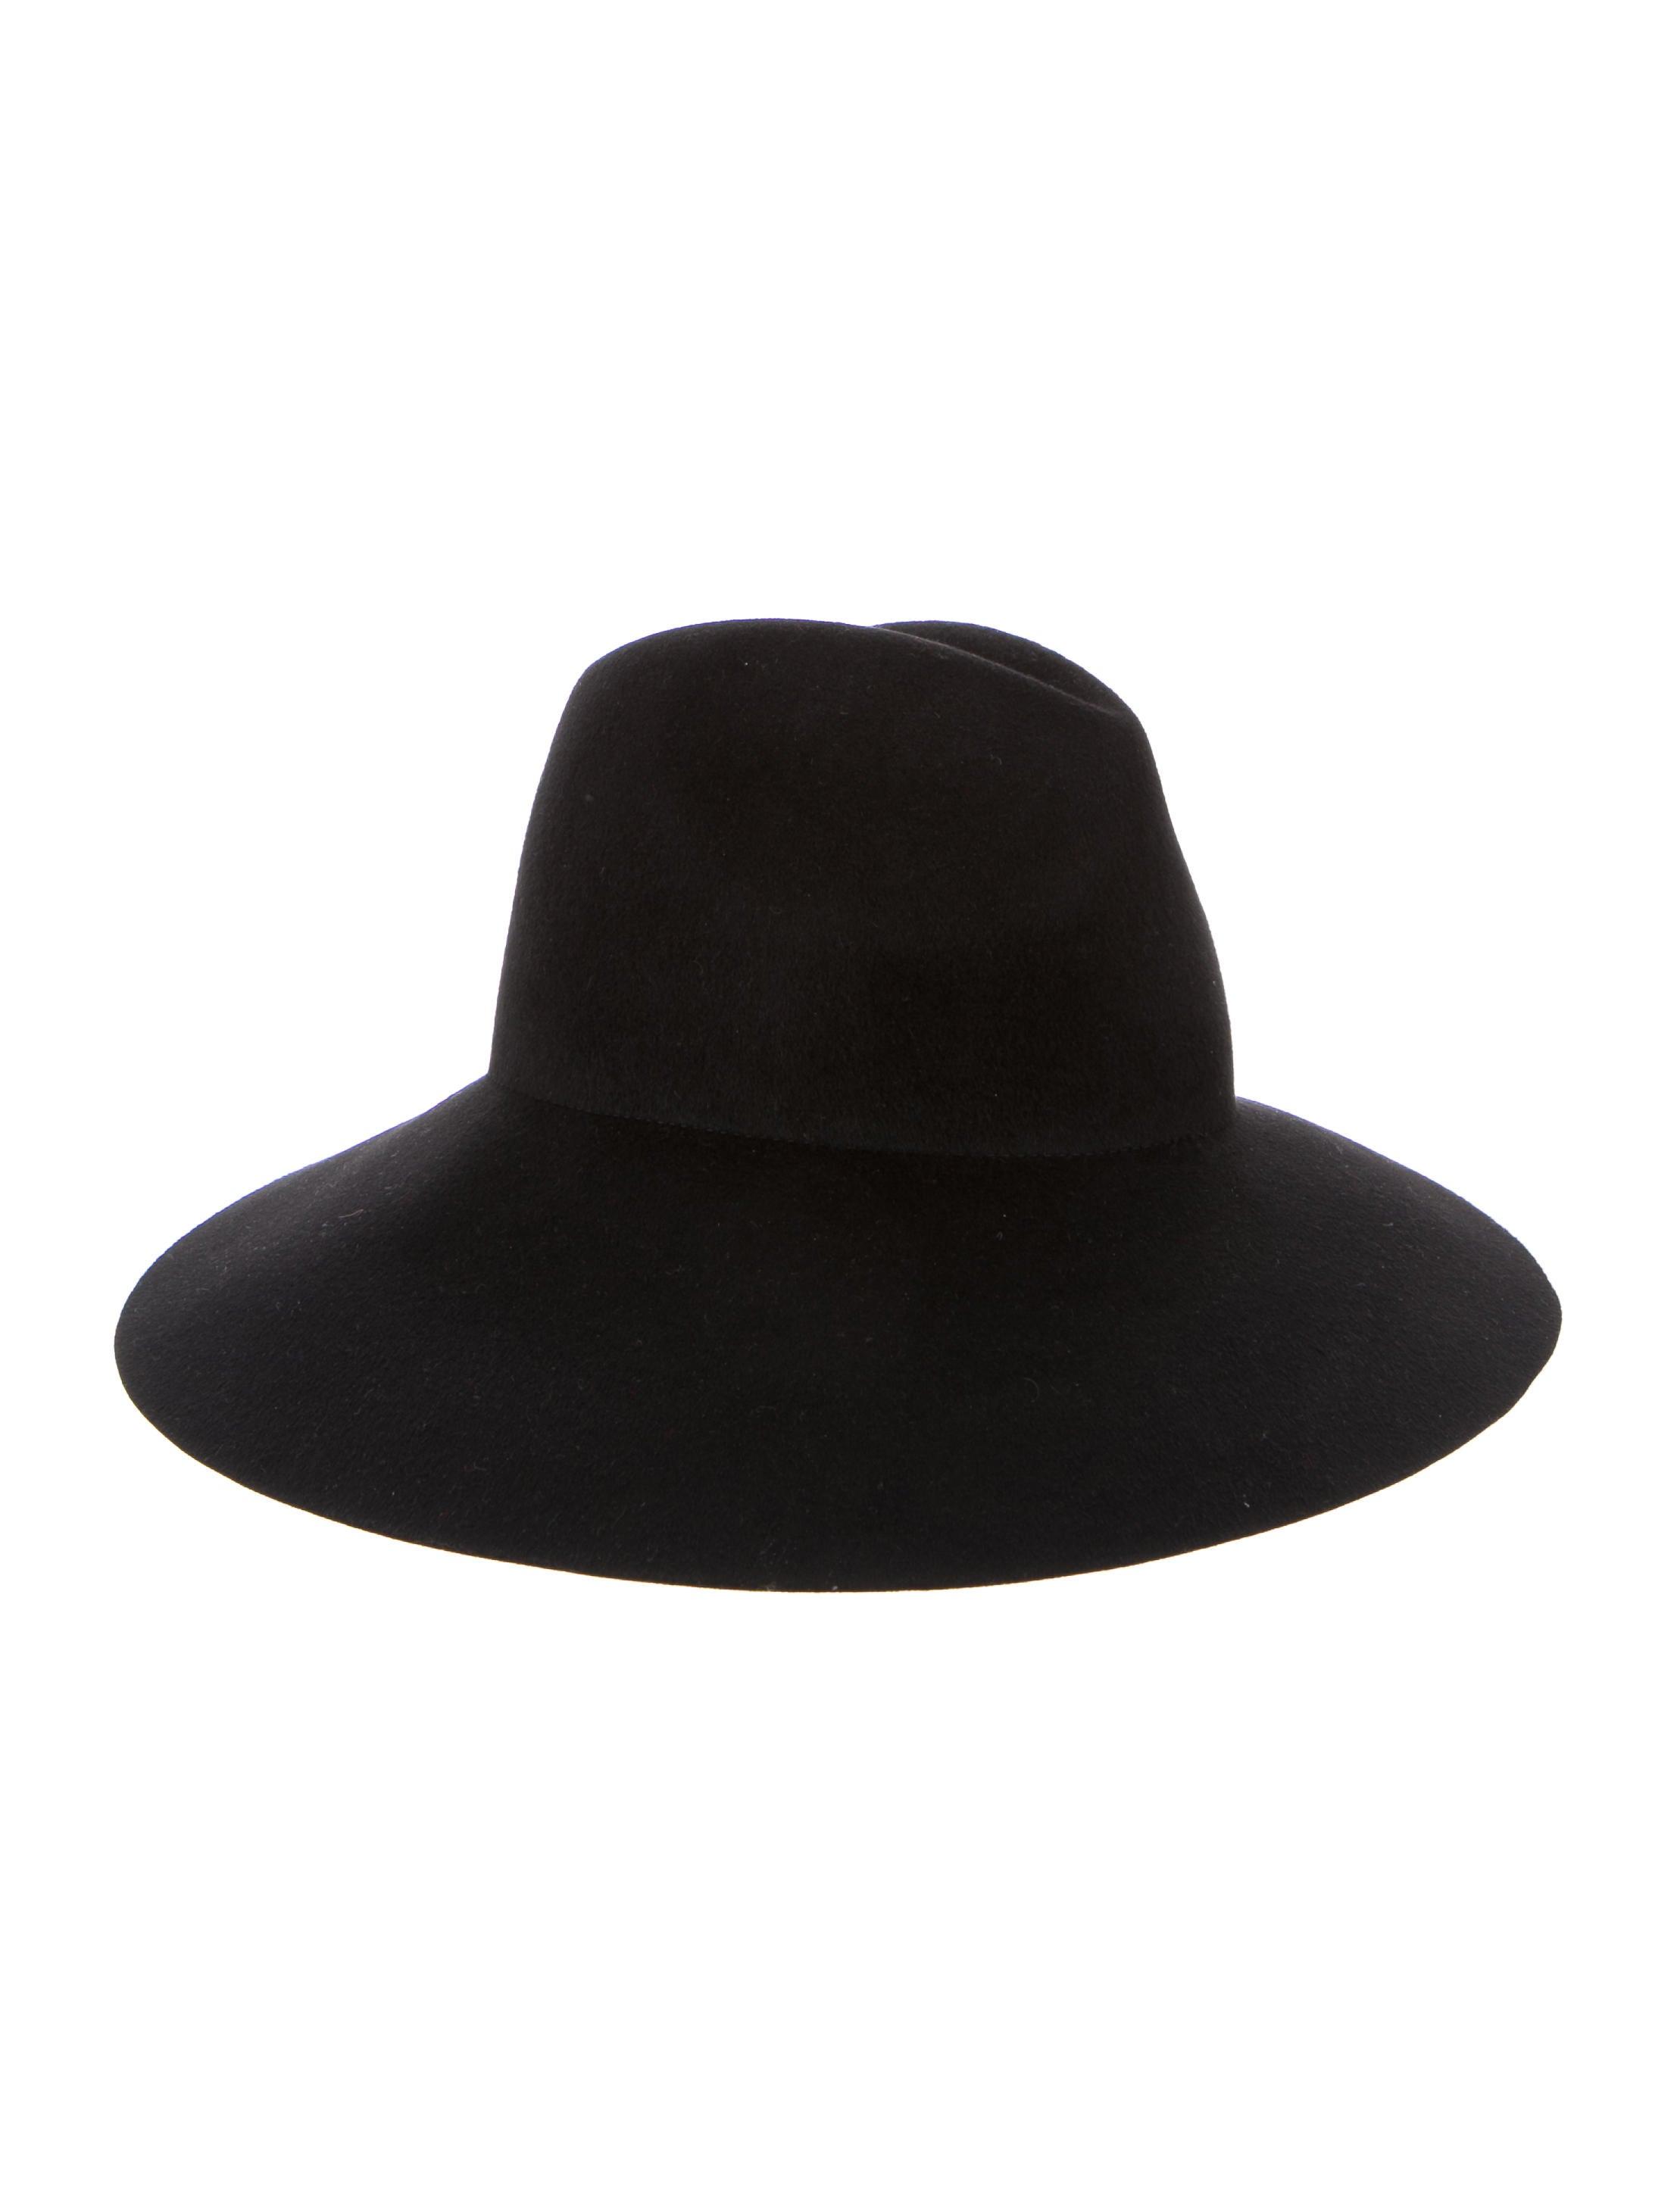 d7292903e170e2 Gucci Felt Wide-Brimmed Hat - Accessories - GUC223110